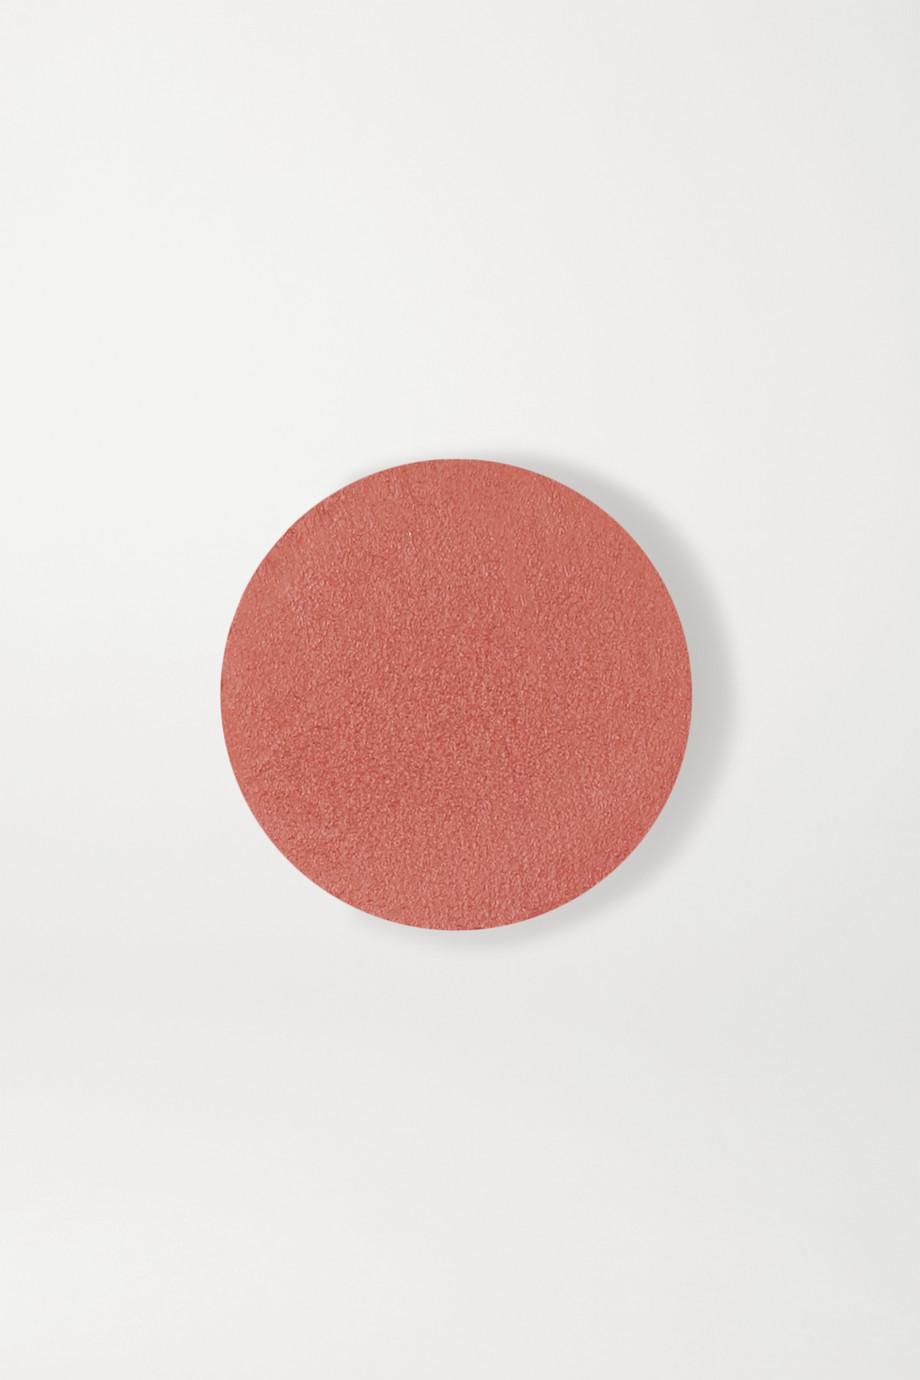 La Bouche Rouge Satin Lipstick Refill - Rosewood